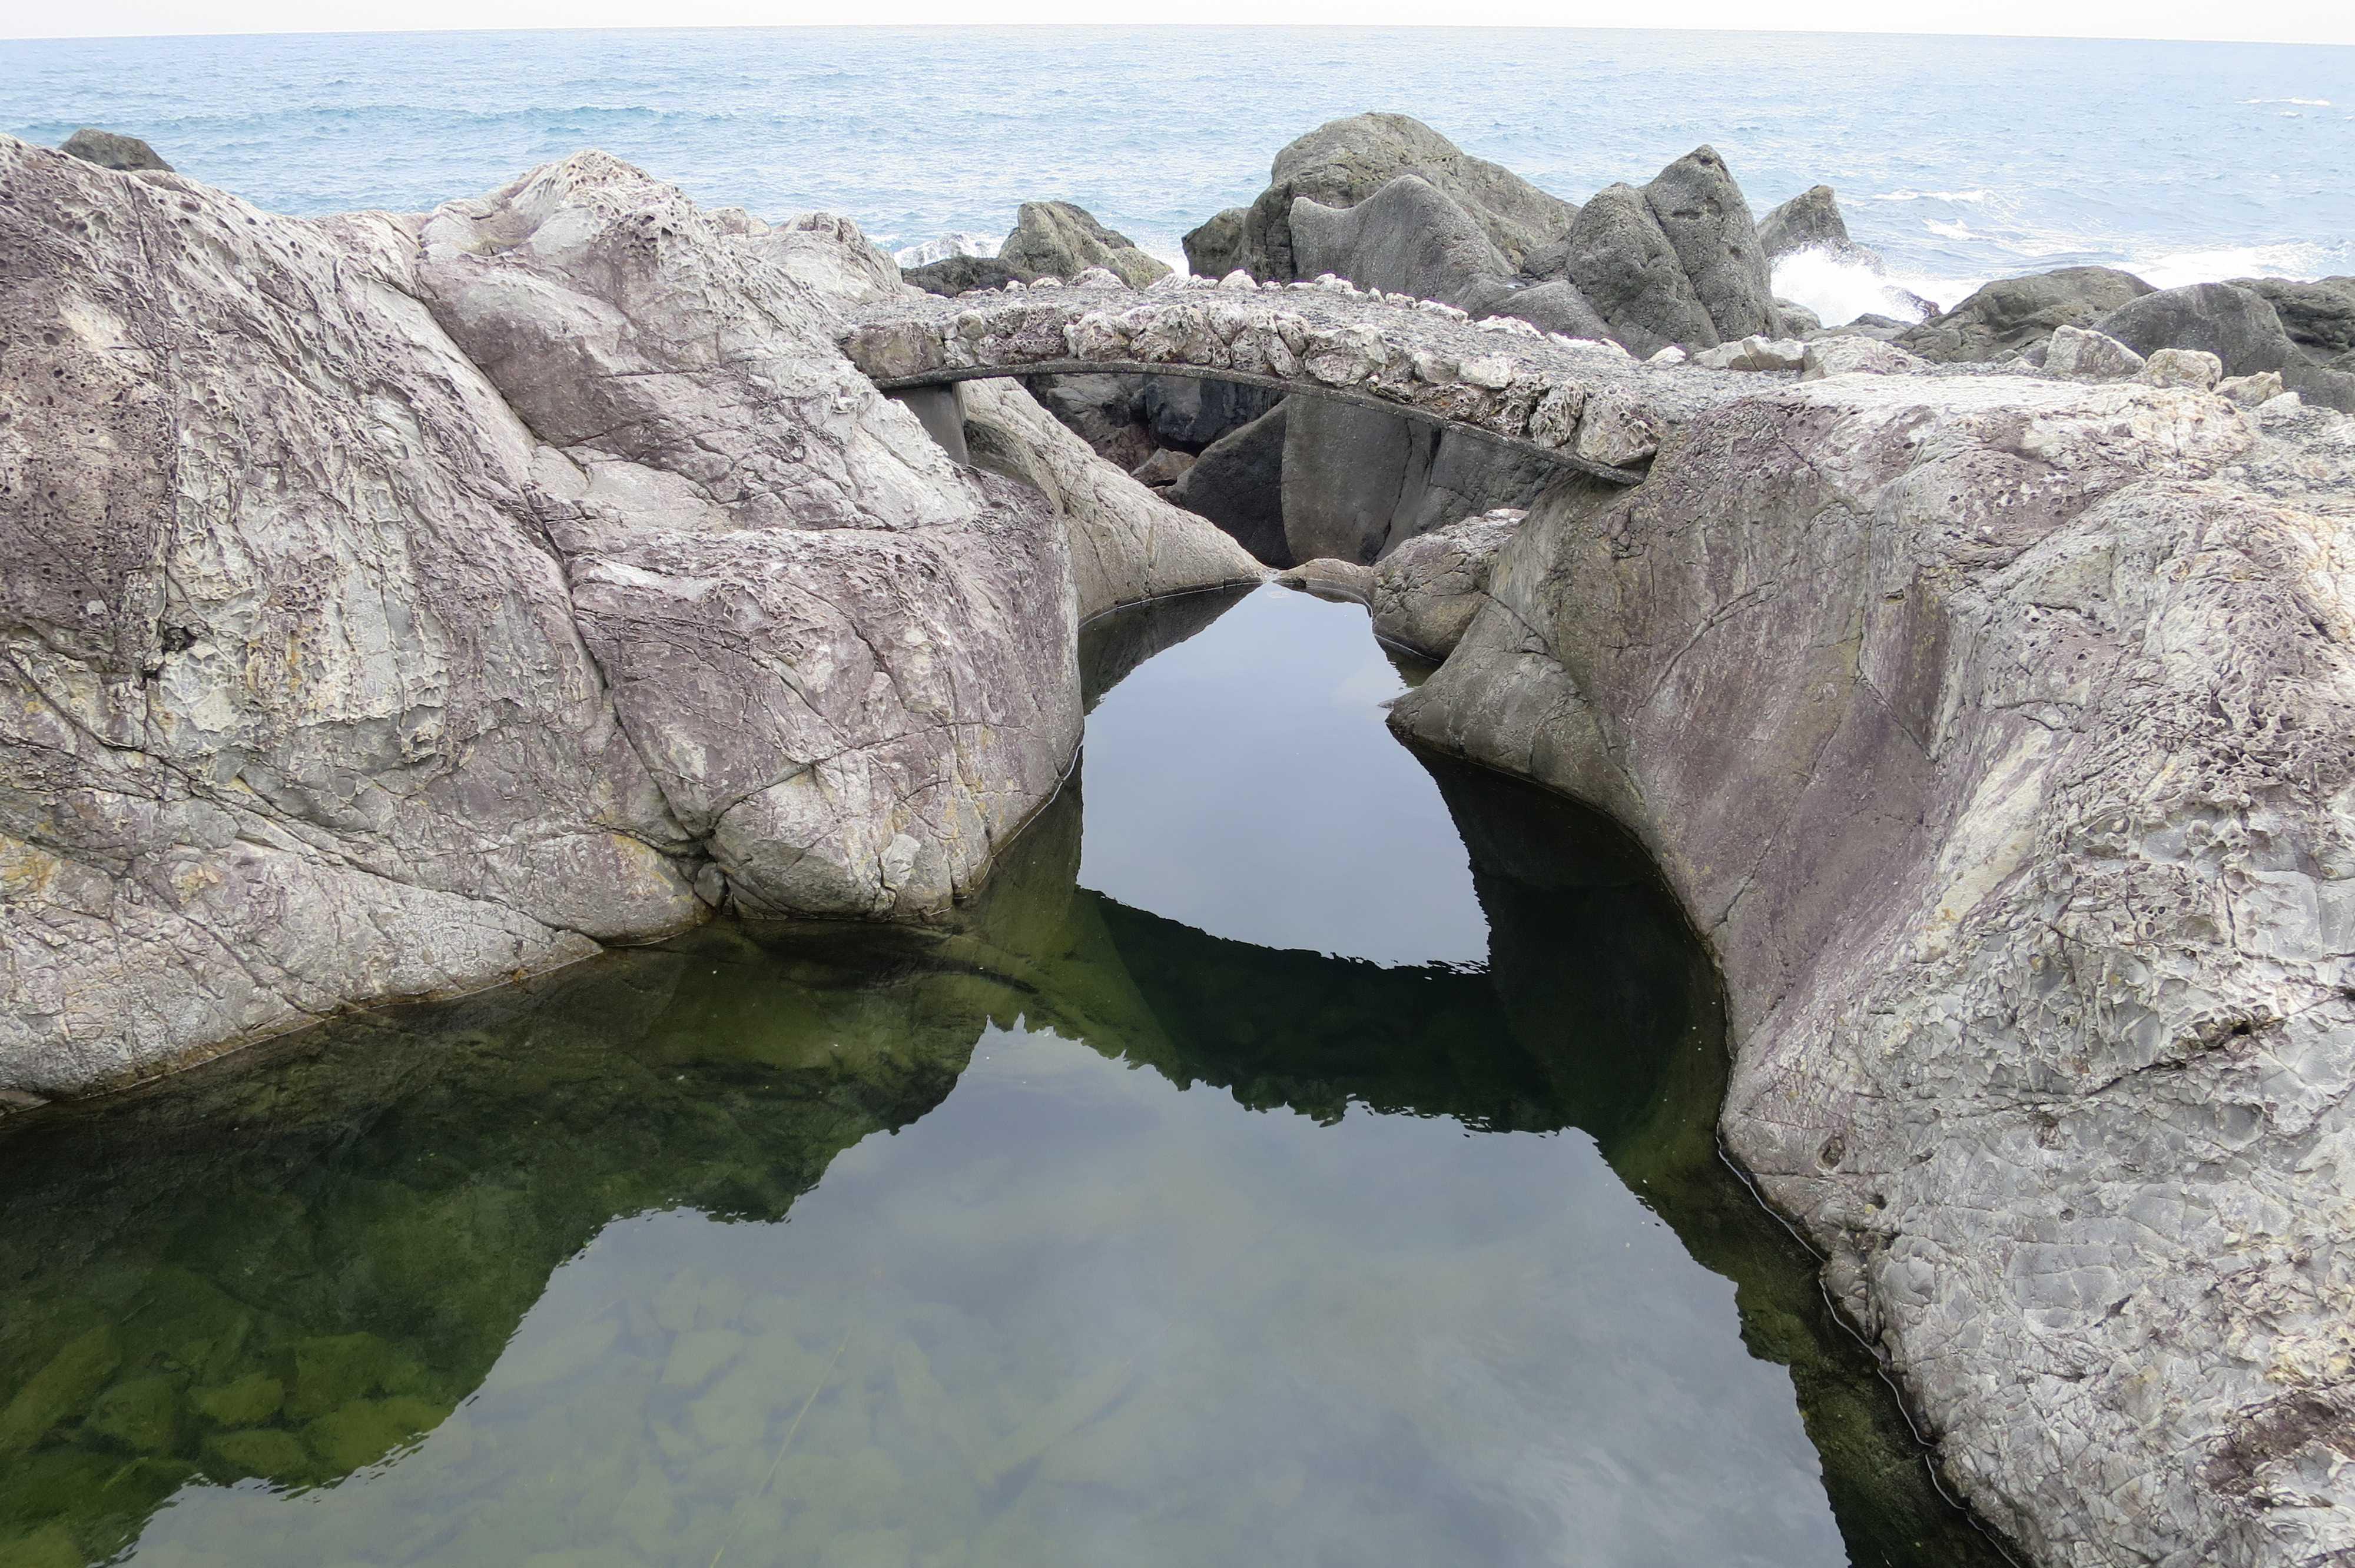 室戸岬の乱礁遊歩道